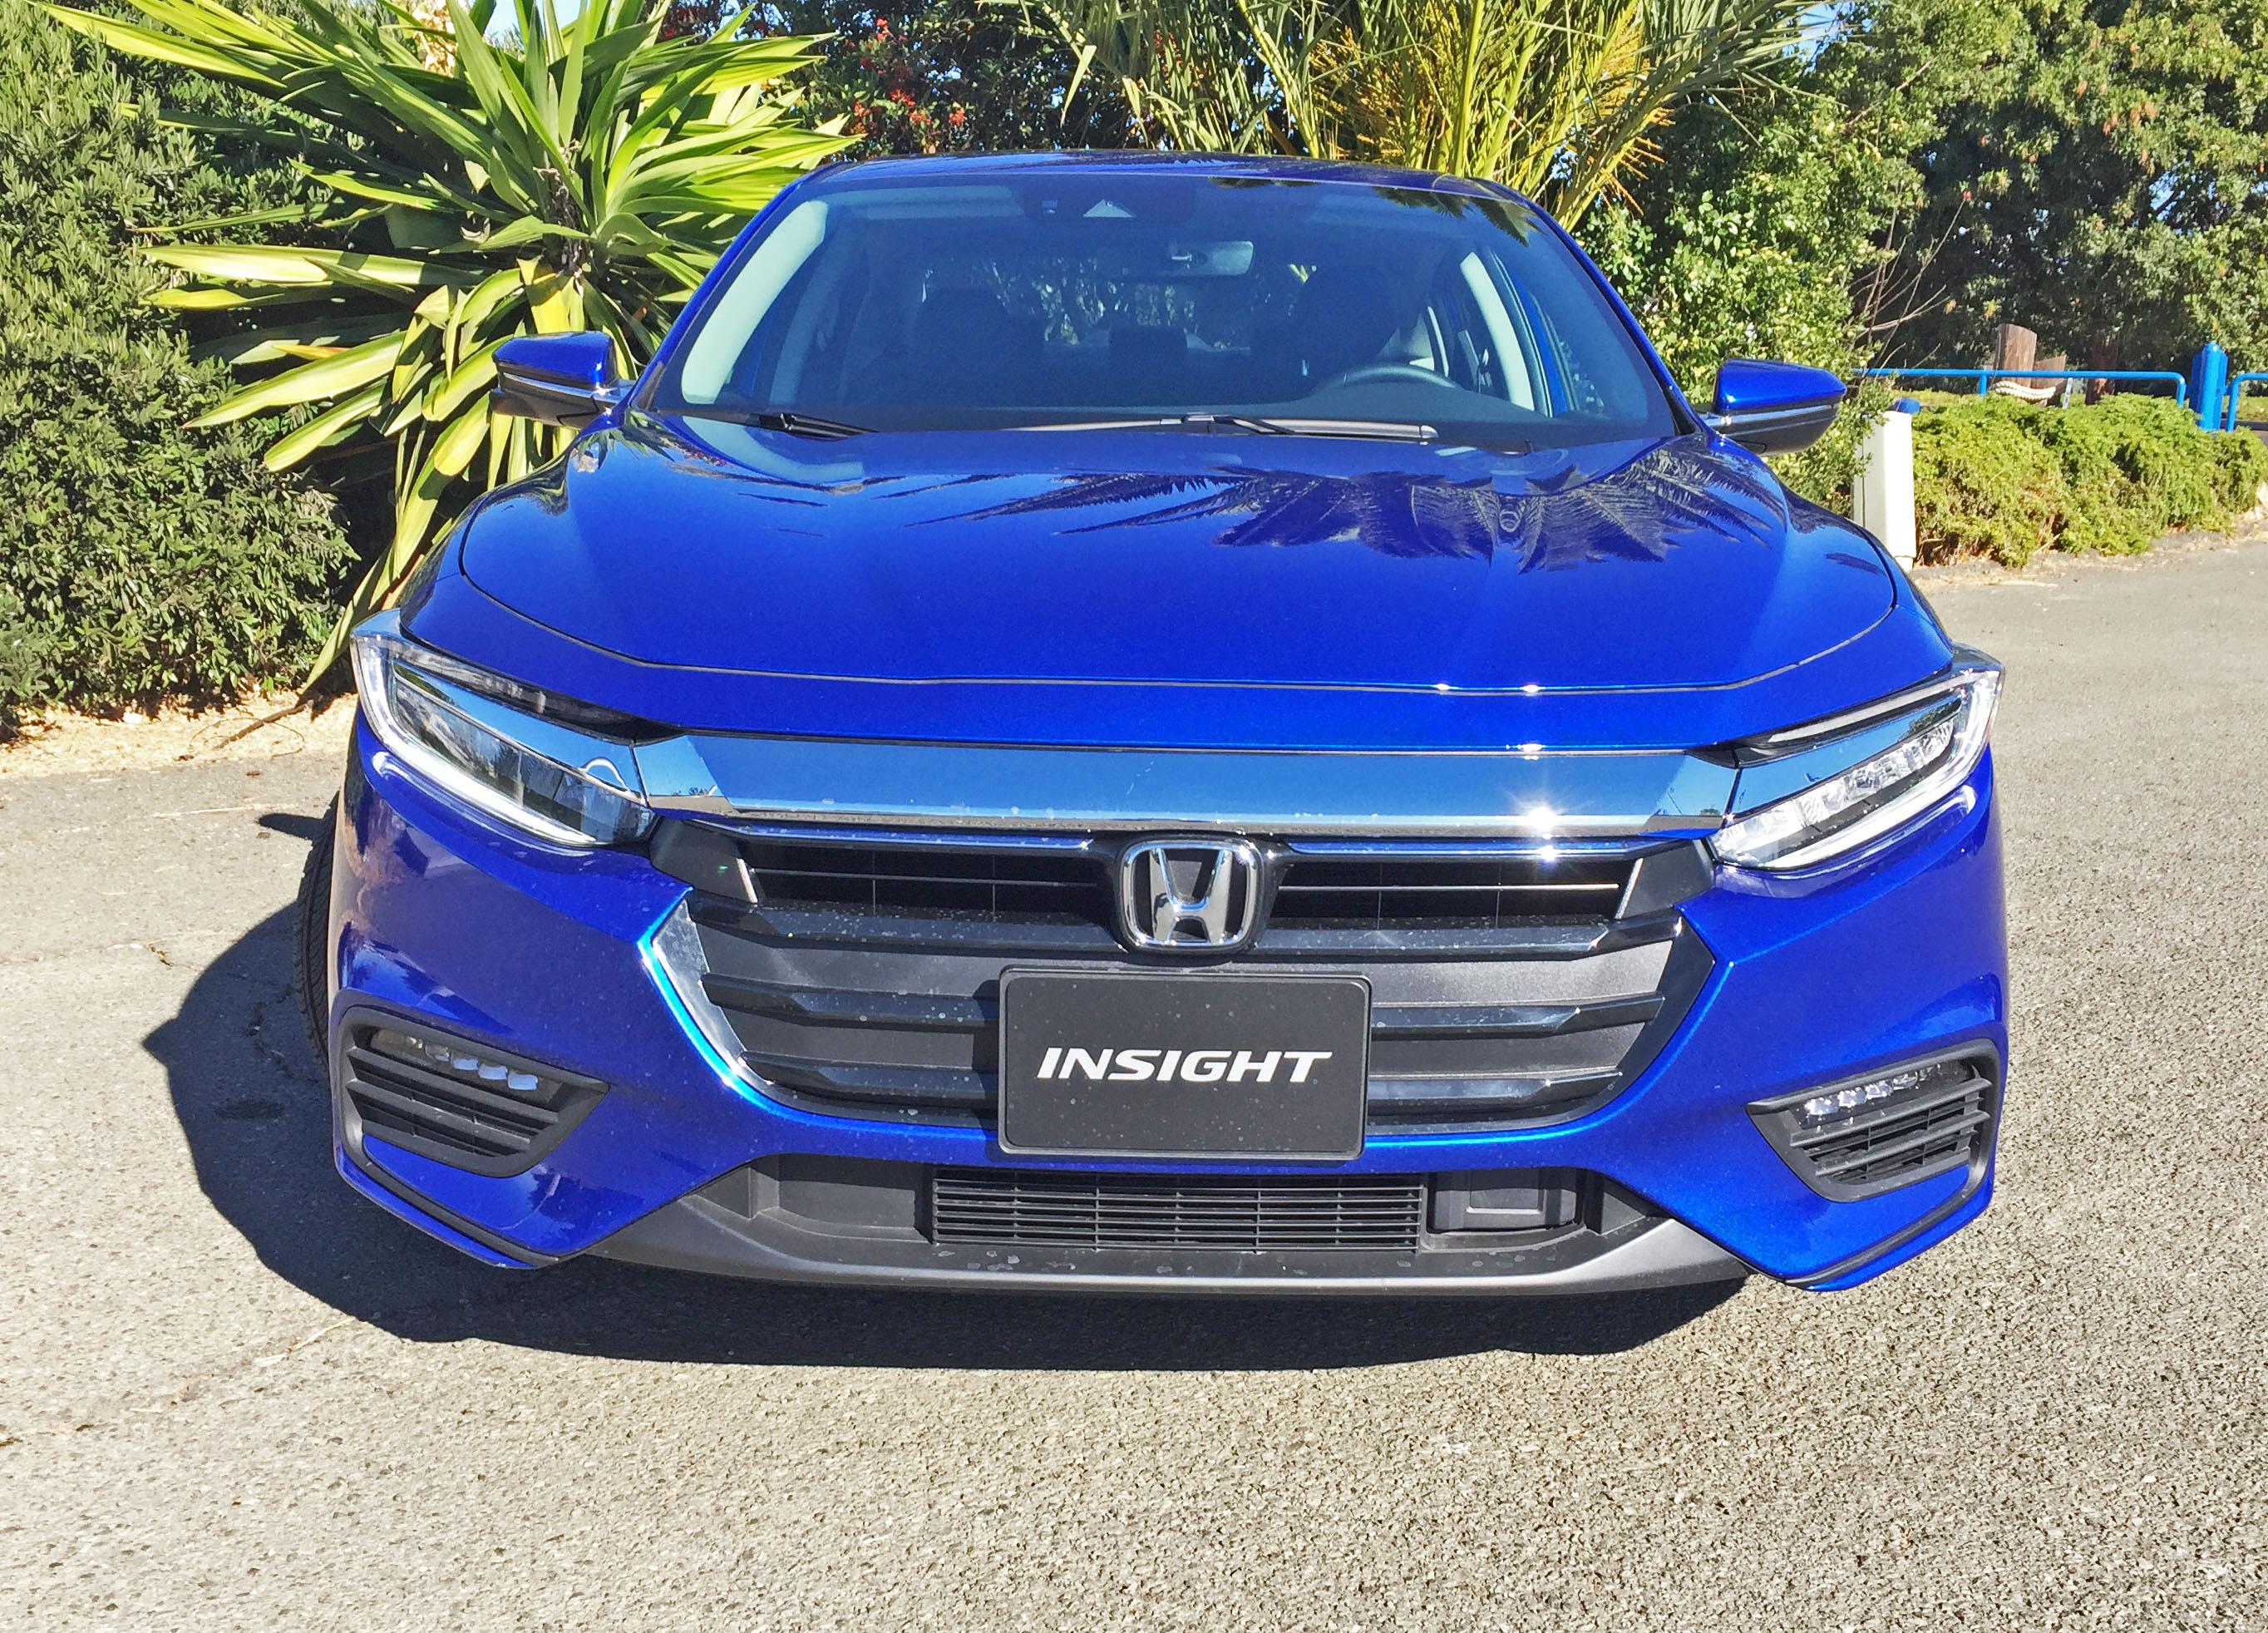 2019 Honda Insight Hybrid Touring Test Drivenbsp